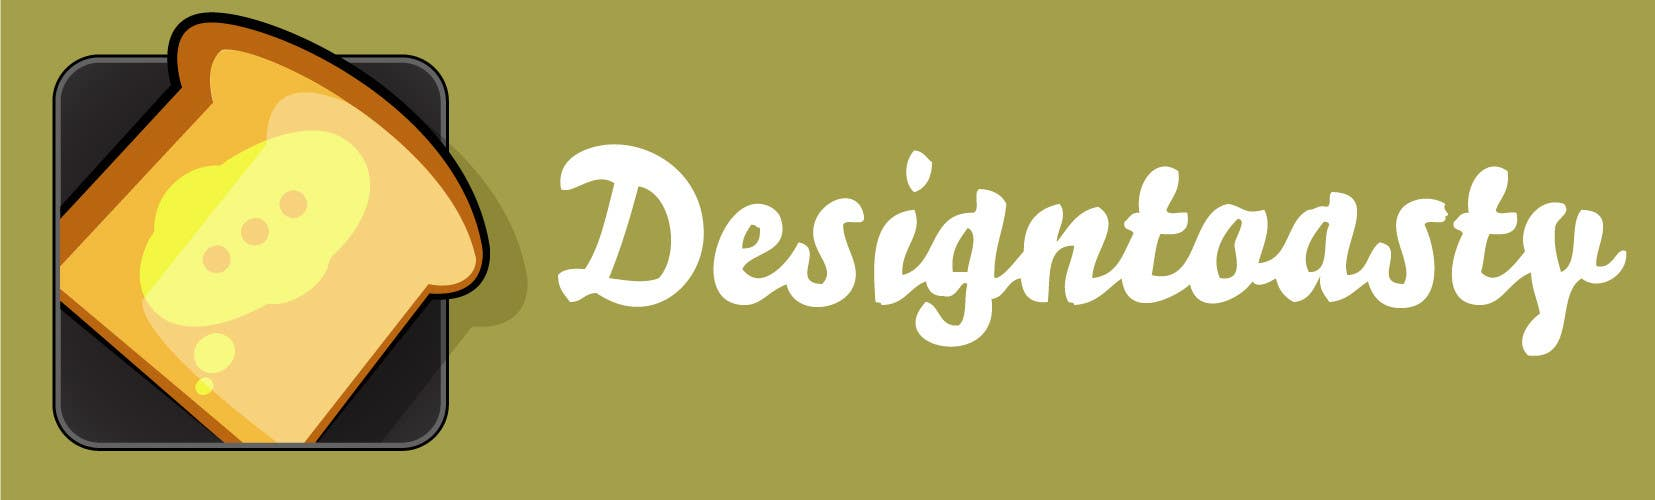 Bài tham dự cuộc thi #9 cho Design Logo-Icons like Envato Marktplaces